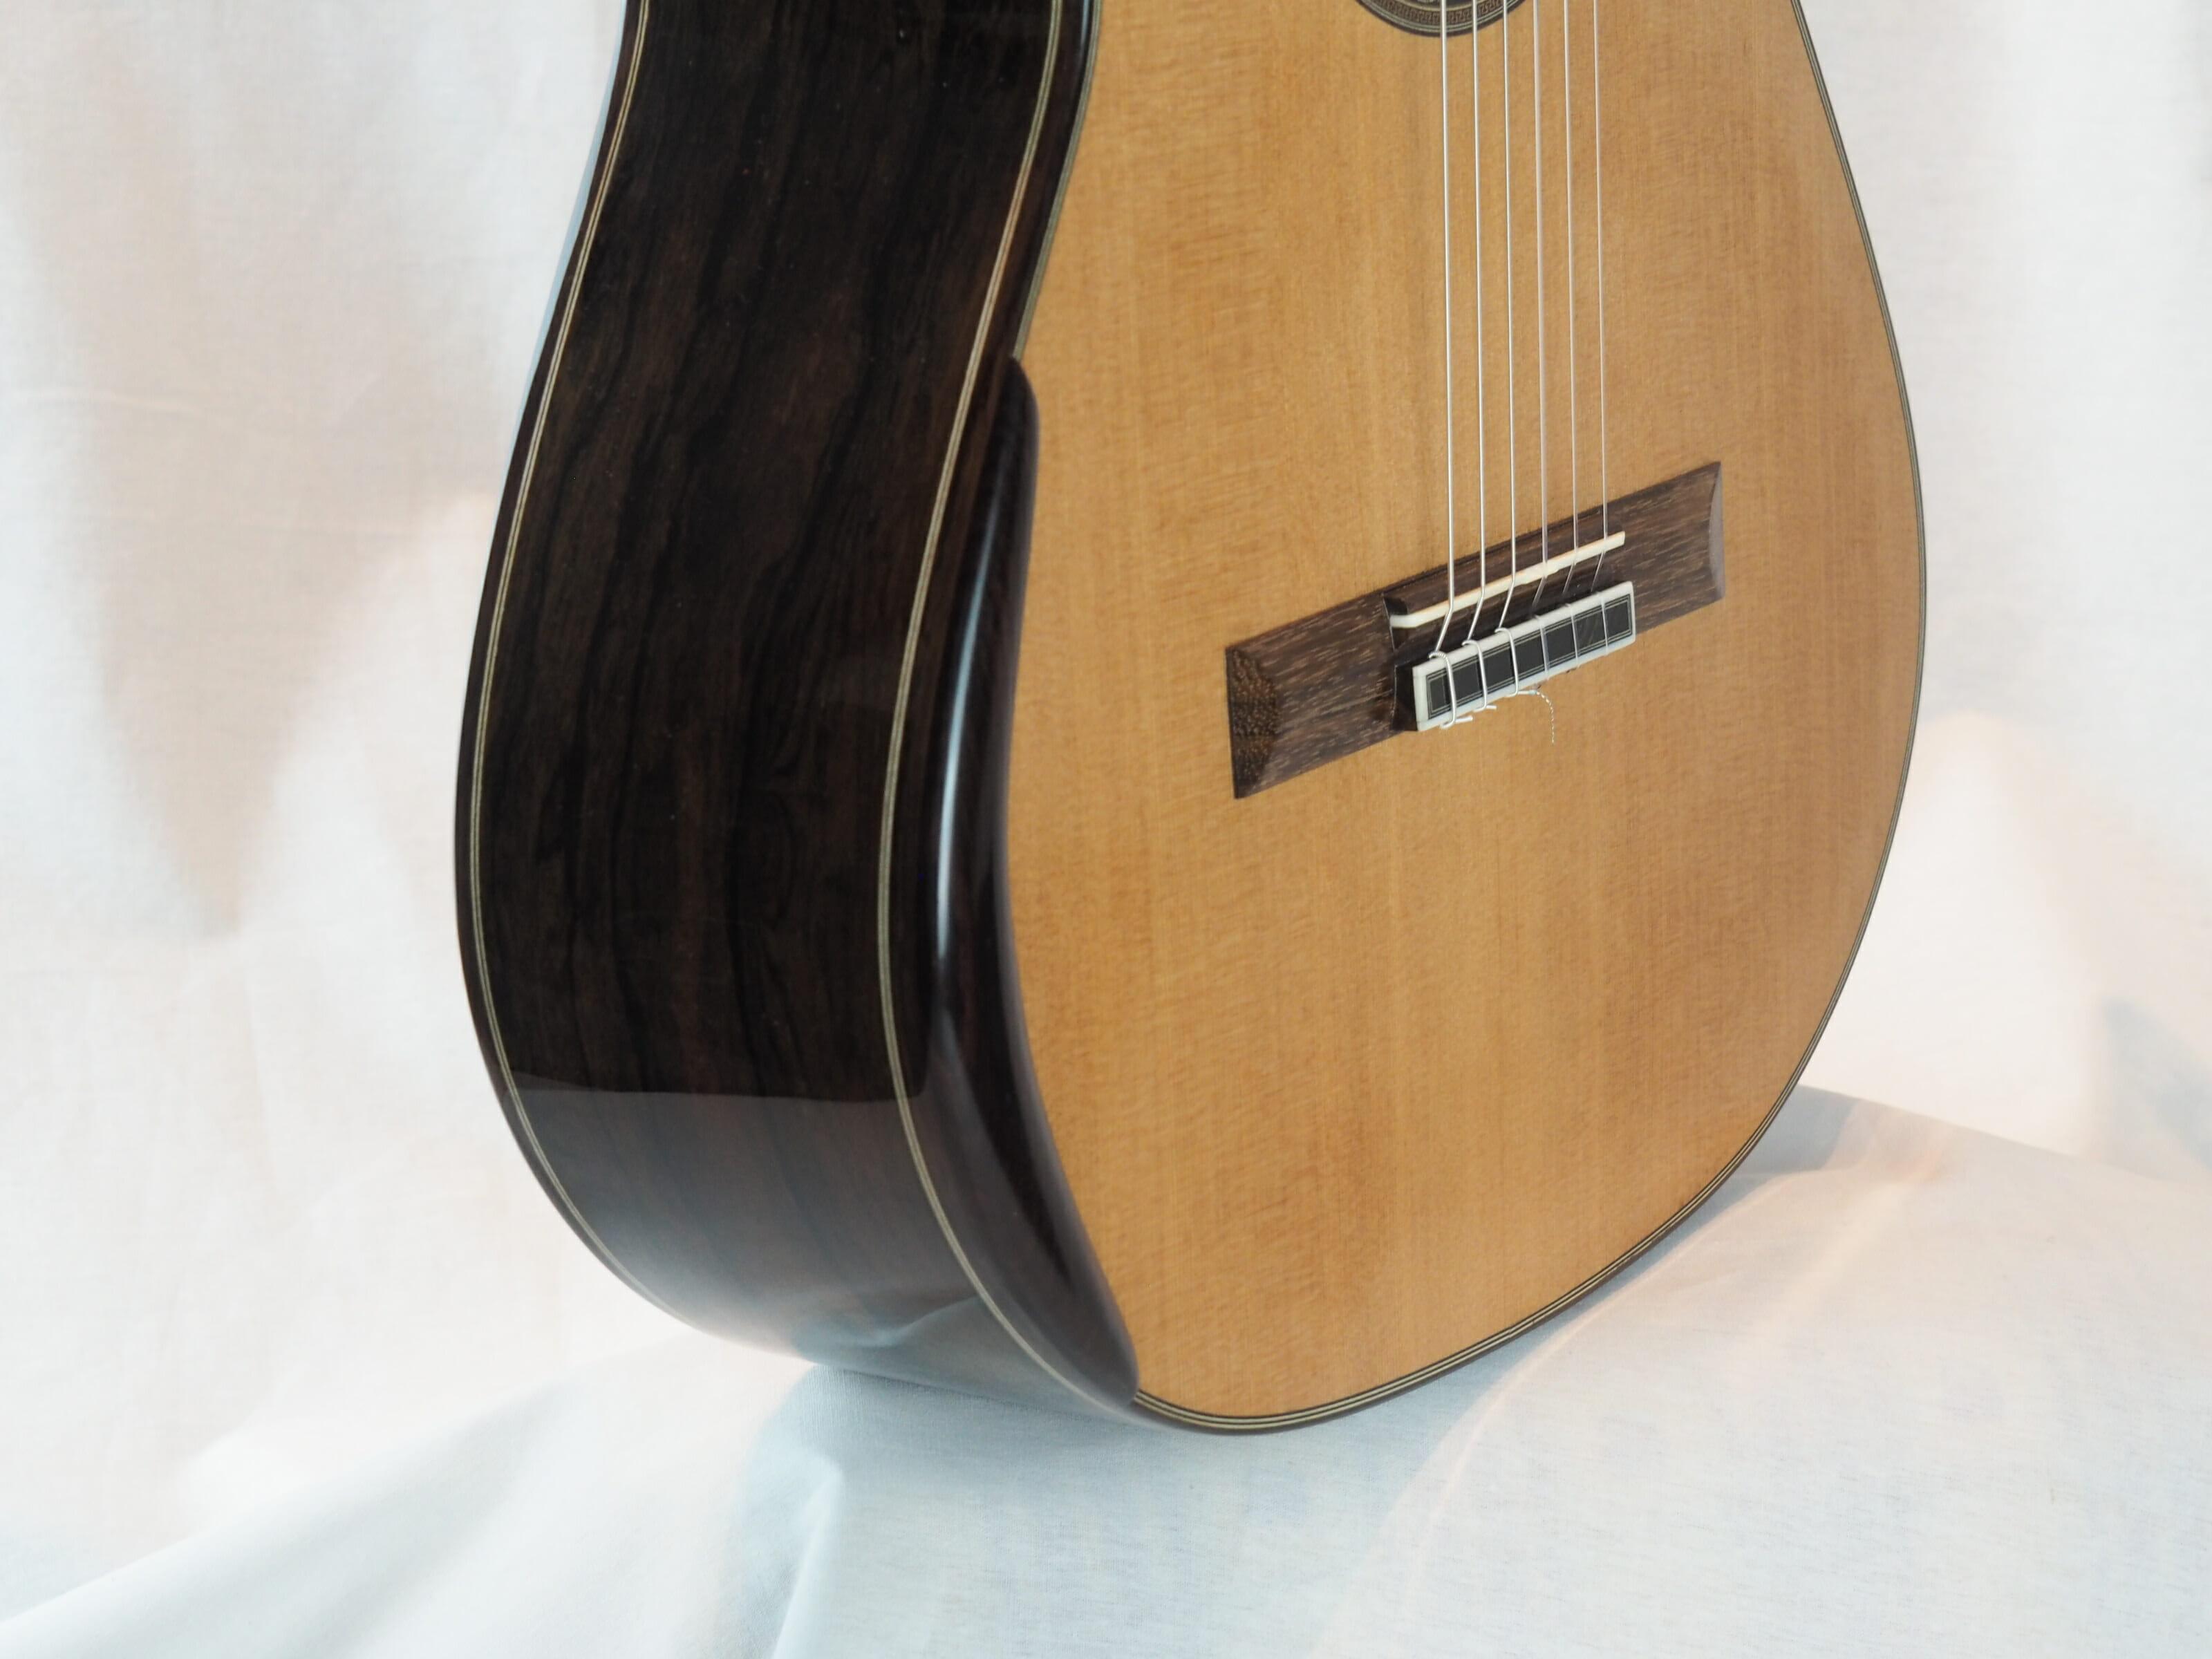 Charalampos Koumridis Luthier guitare classique N°139 19KOU139-04